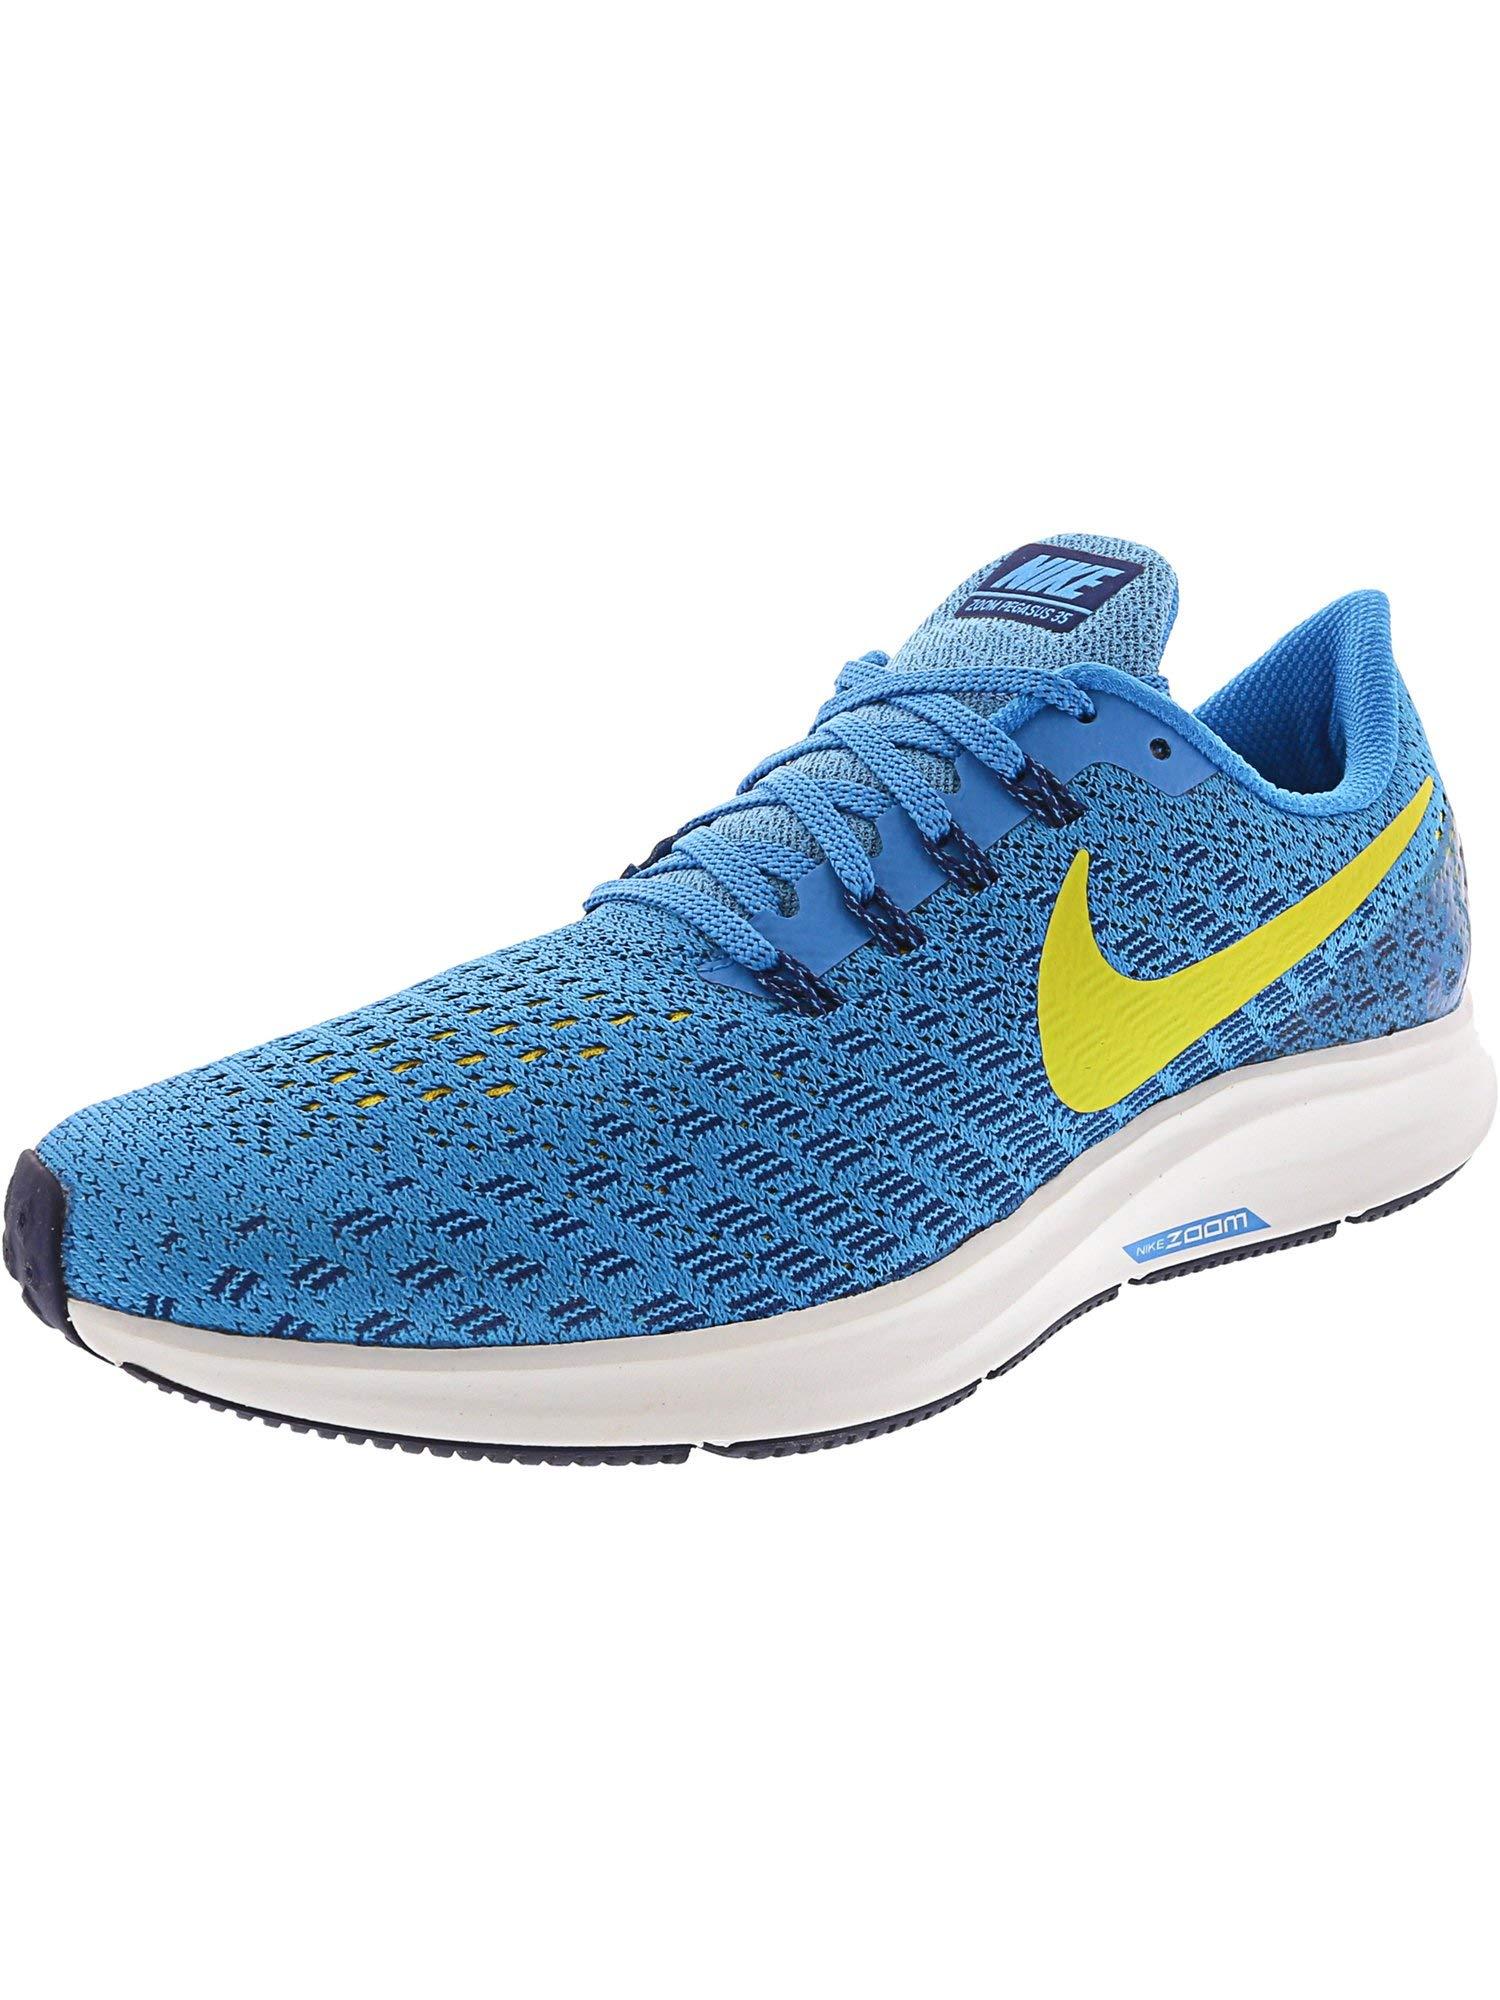 Nike Men's Air Zoom Pegasus 35 Blue Orbit/Bright Citron Ankle-High Mesh Running Shoe - 6.5M